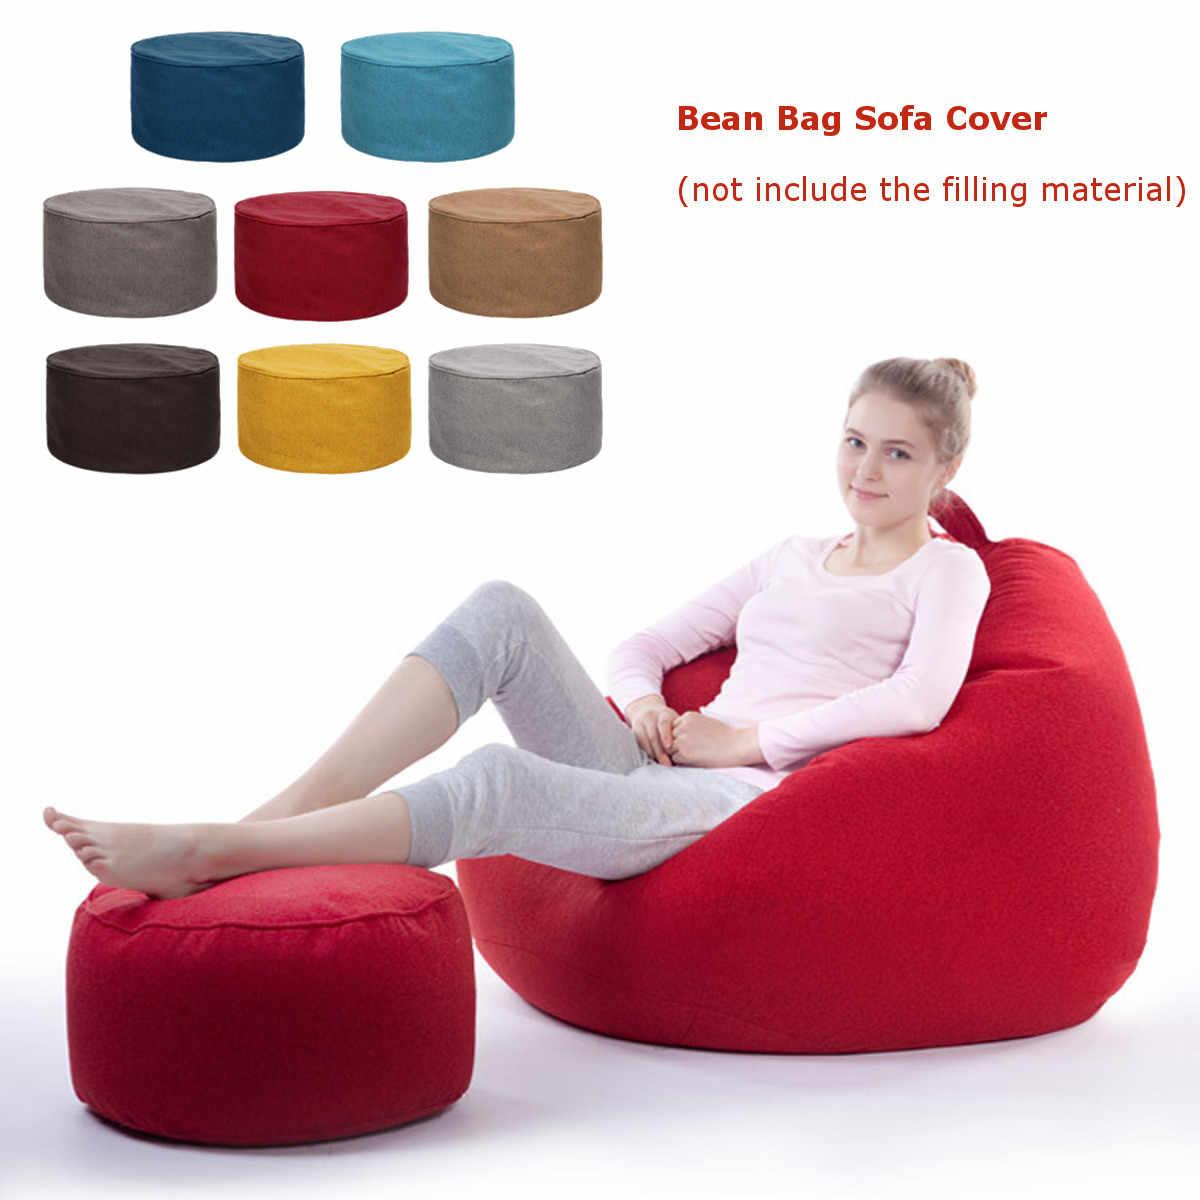 Cover Home Sofa Round Stool Bean Bags